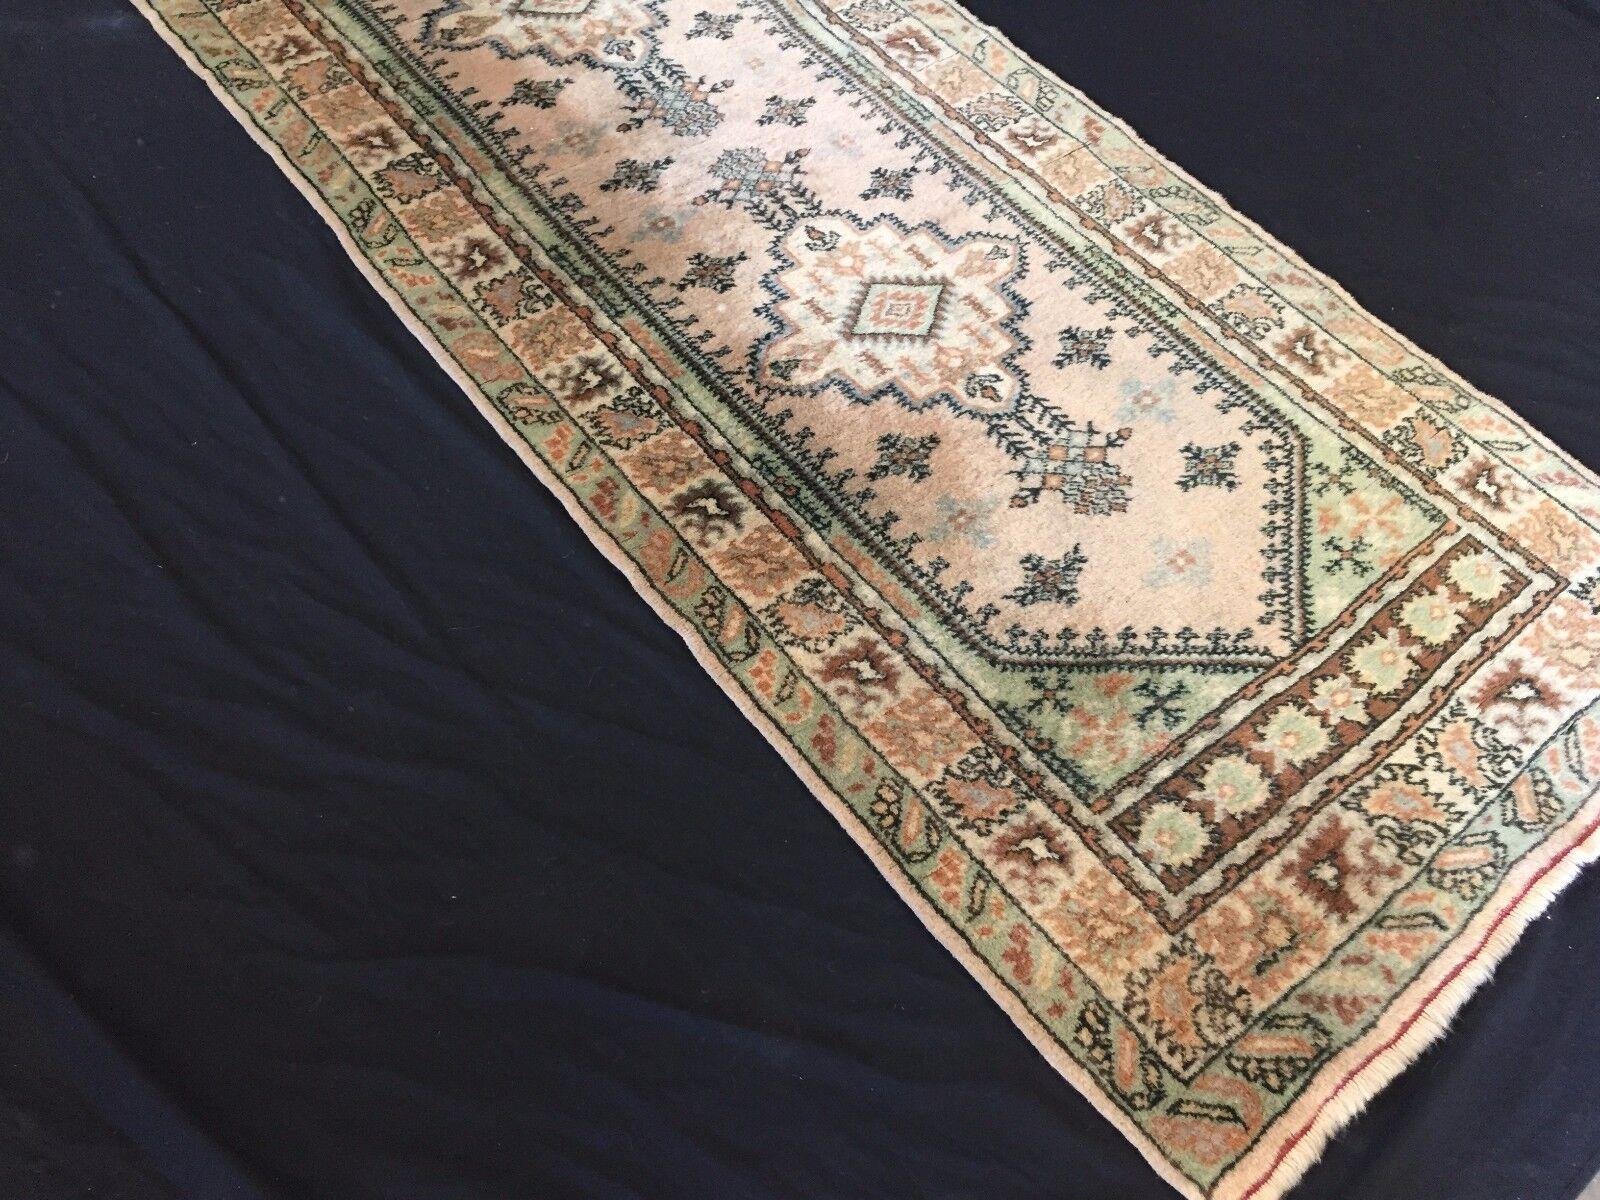 Antiguo John Lewis turco Kula Corrojoor De Lana Oriental y tribales hecha a mano 327x83cm